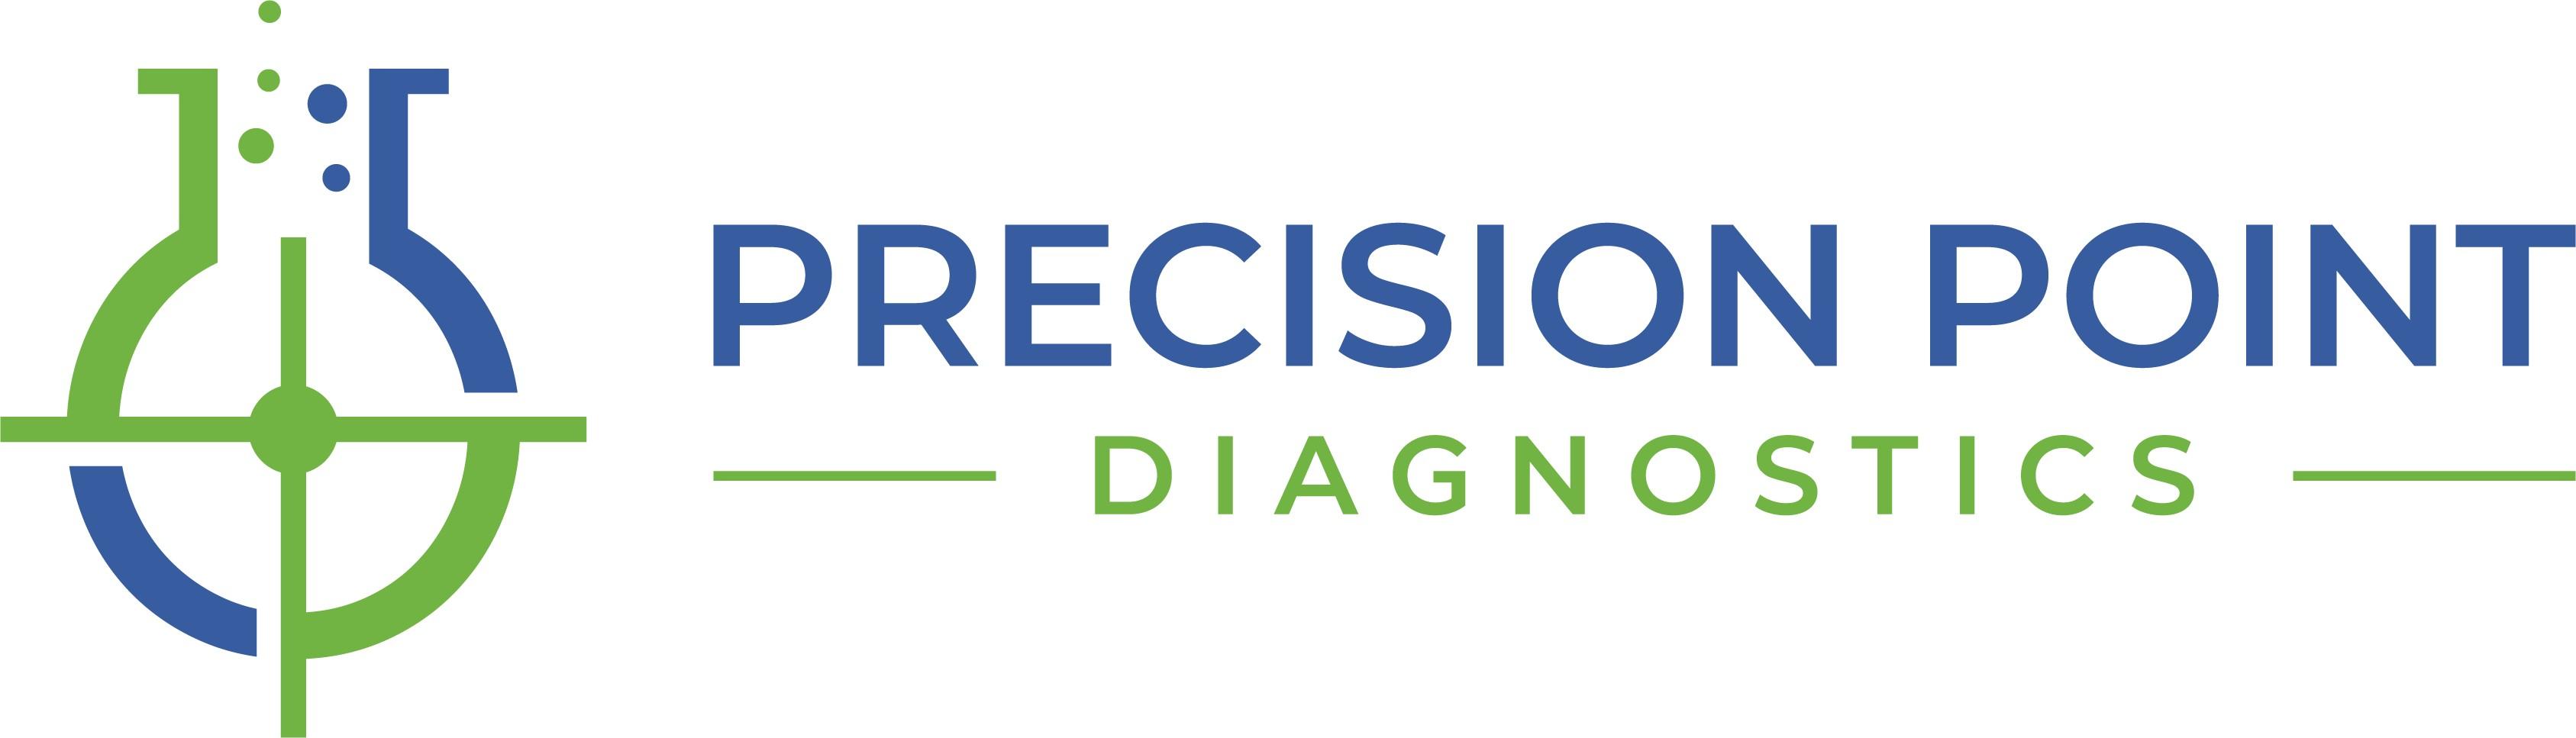 Precision Point Diagnostics | LinkedIn